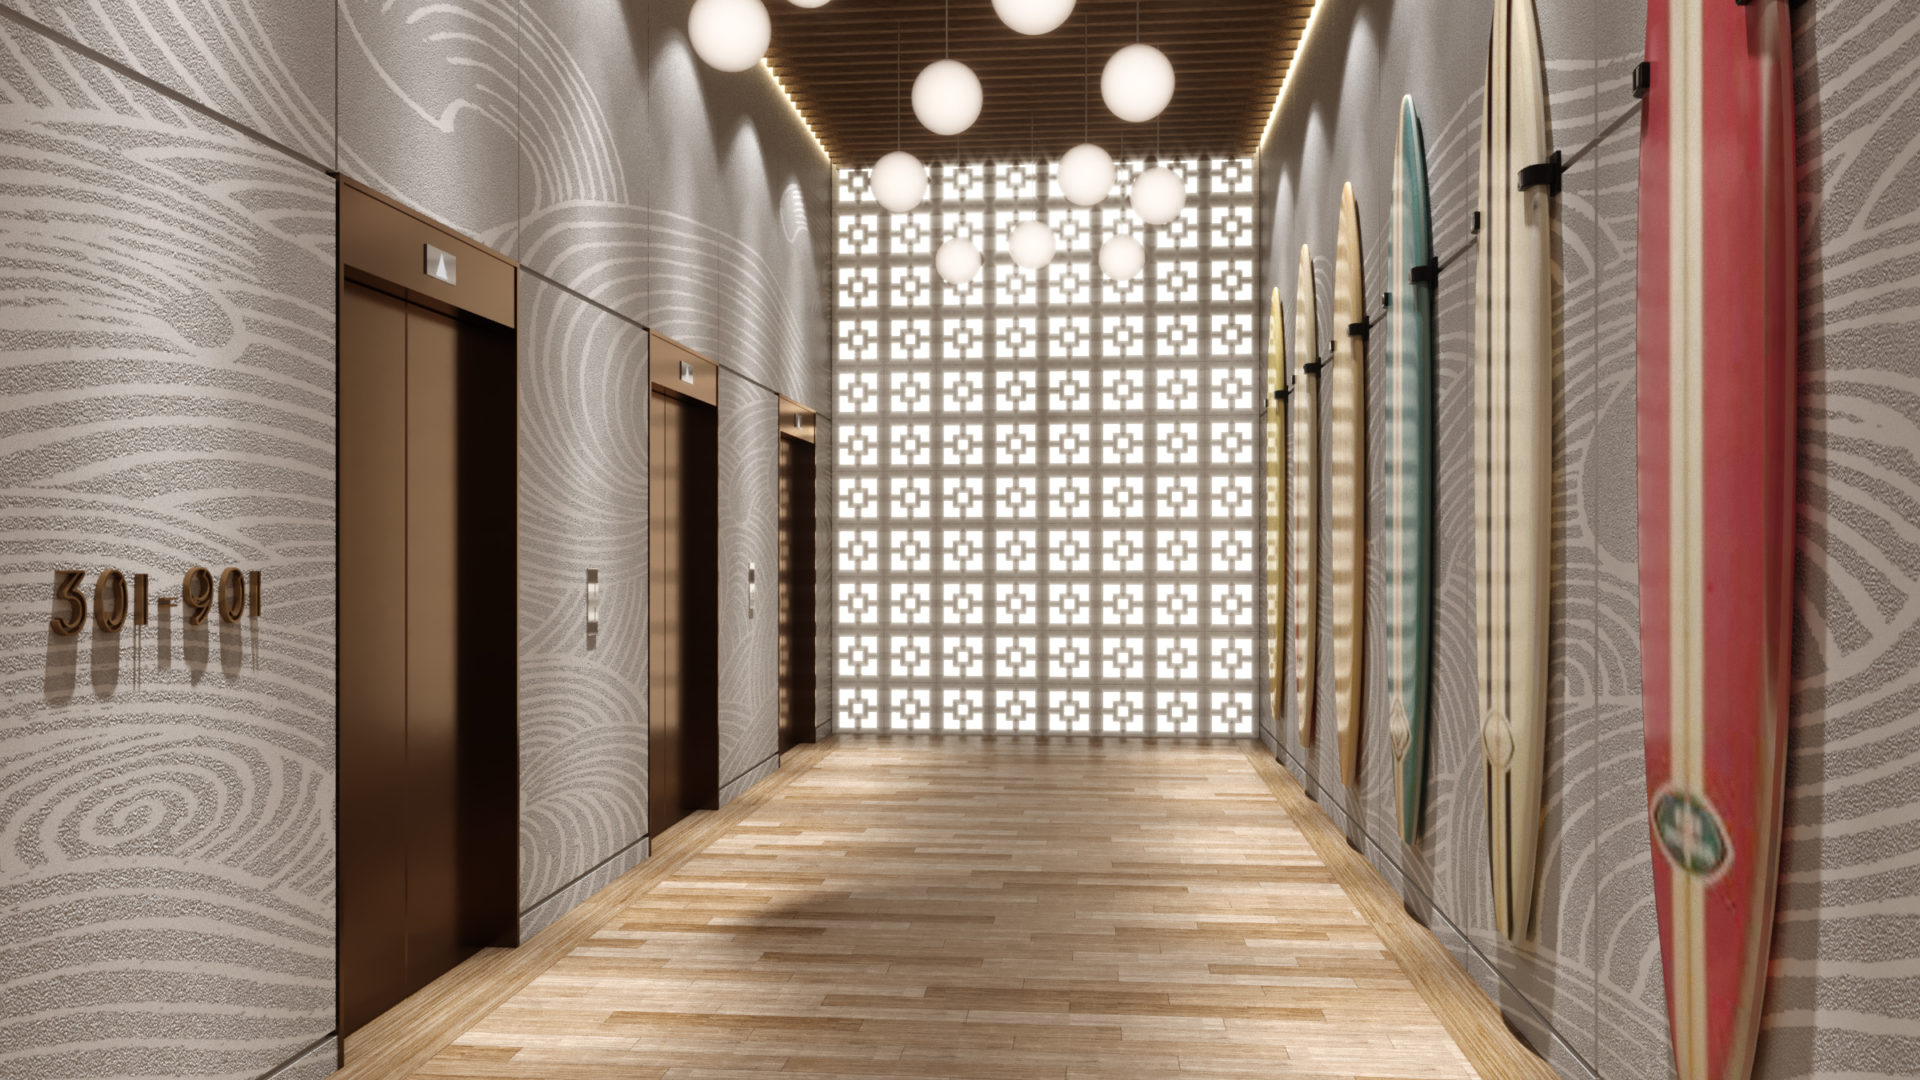 17-0876-Lift Lobby-R04-Op01-V01